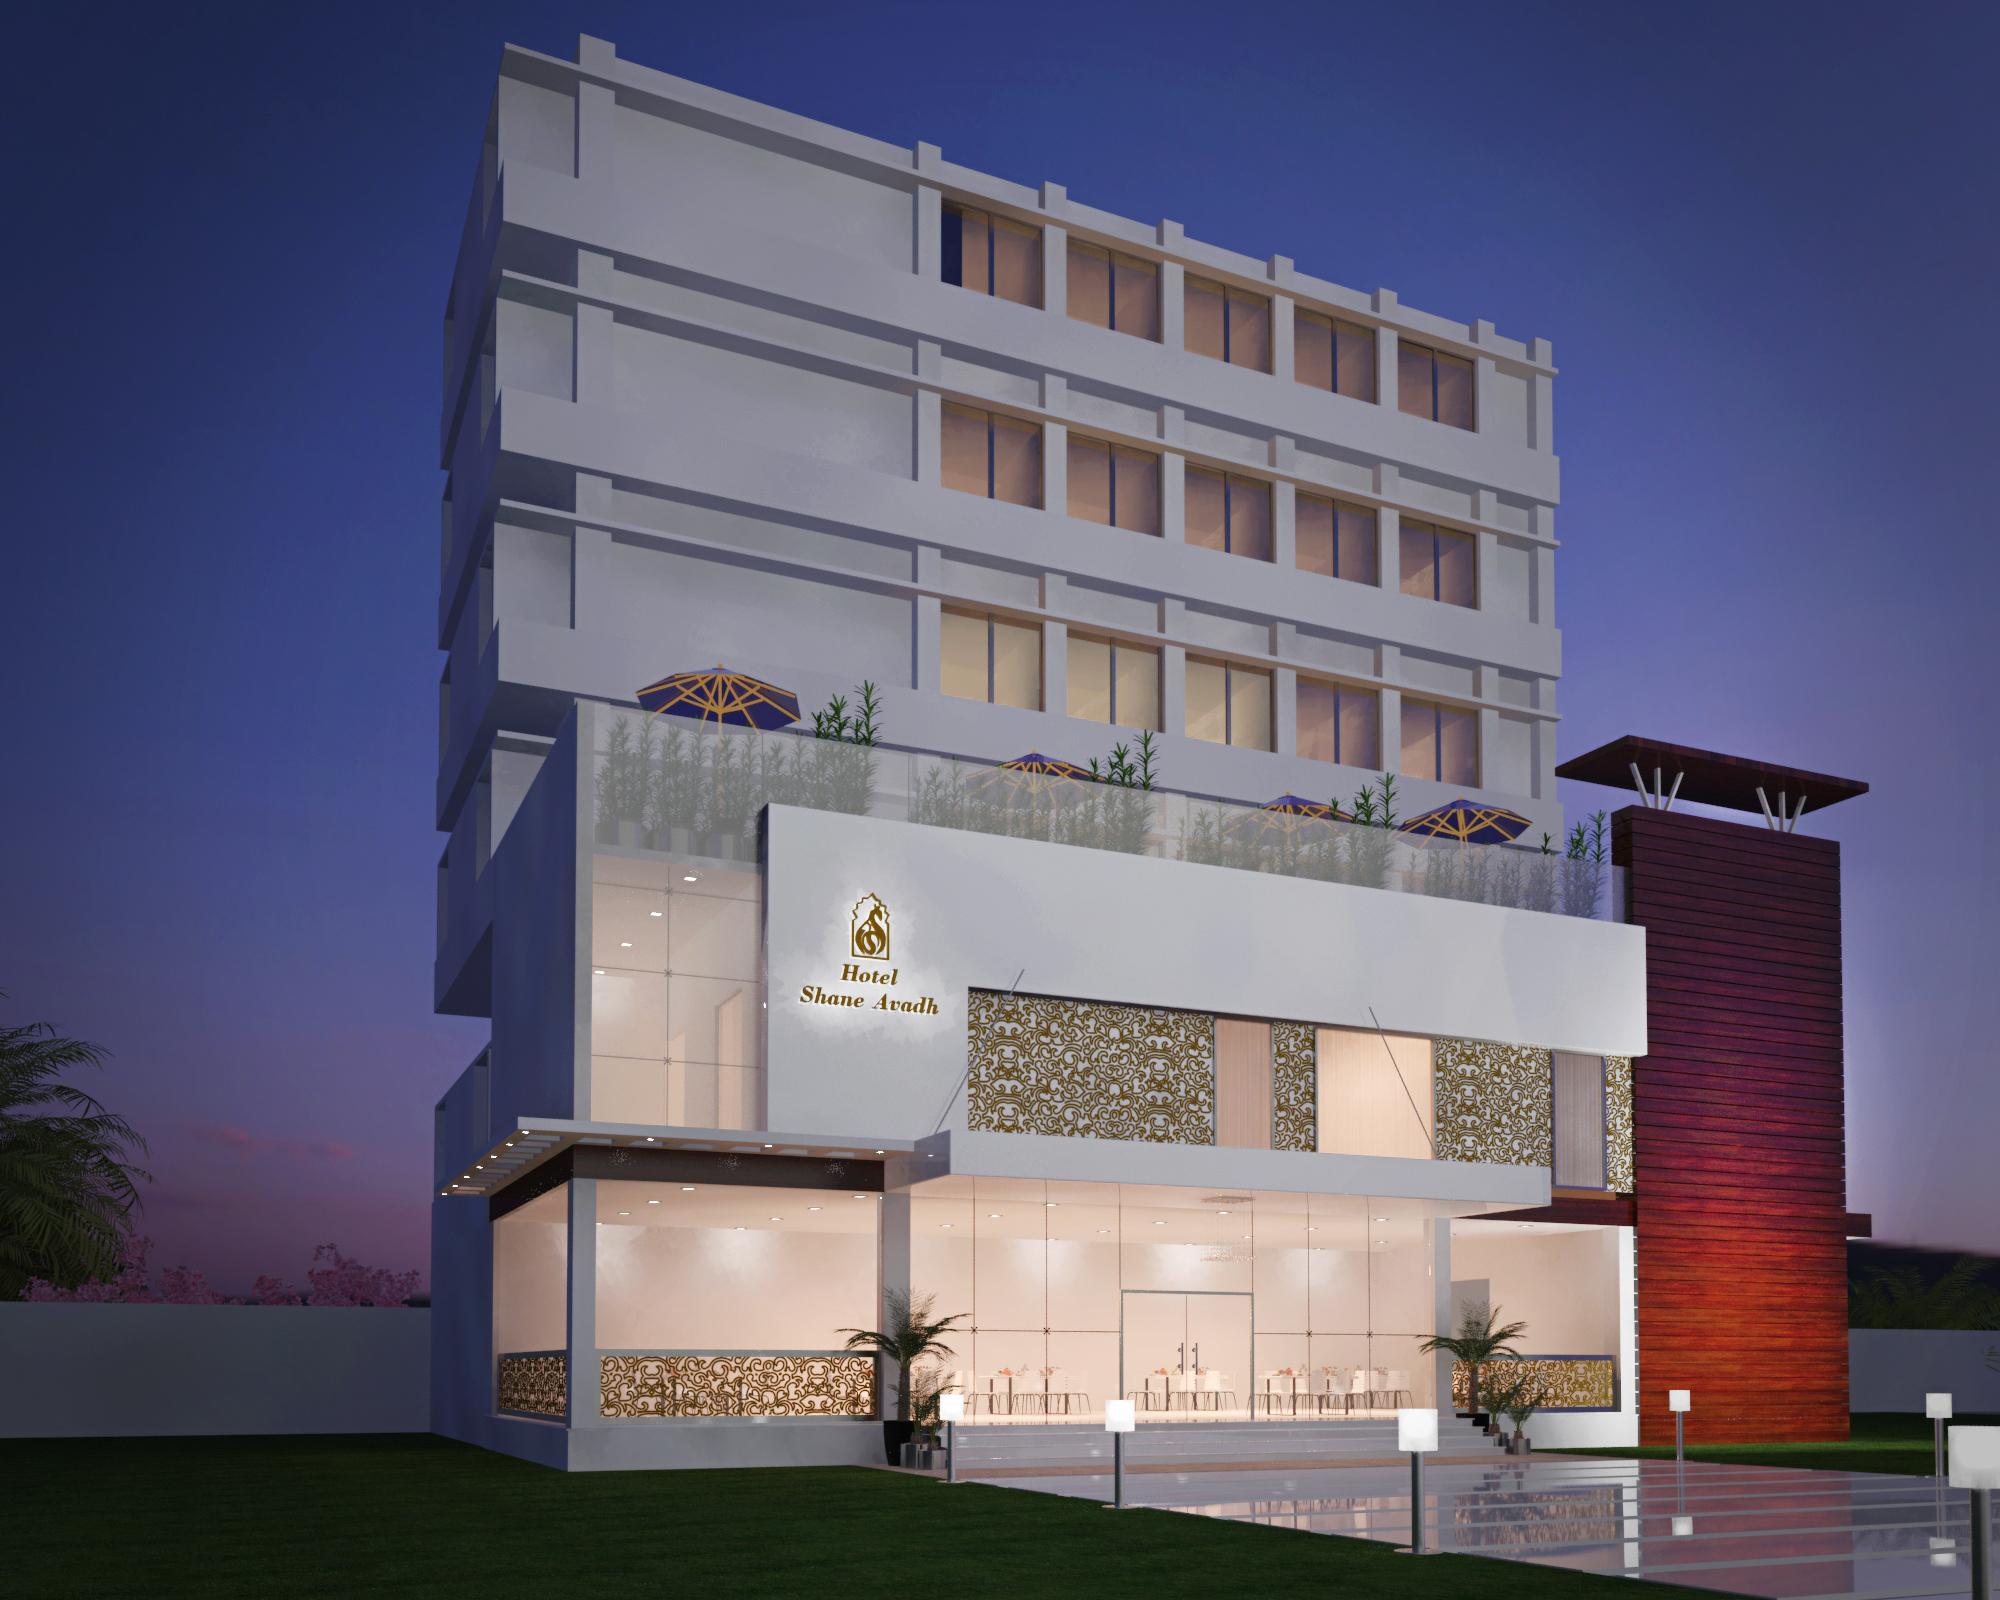 Hotel Shane Avadh in faizabad